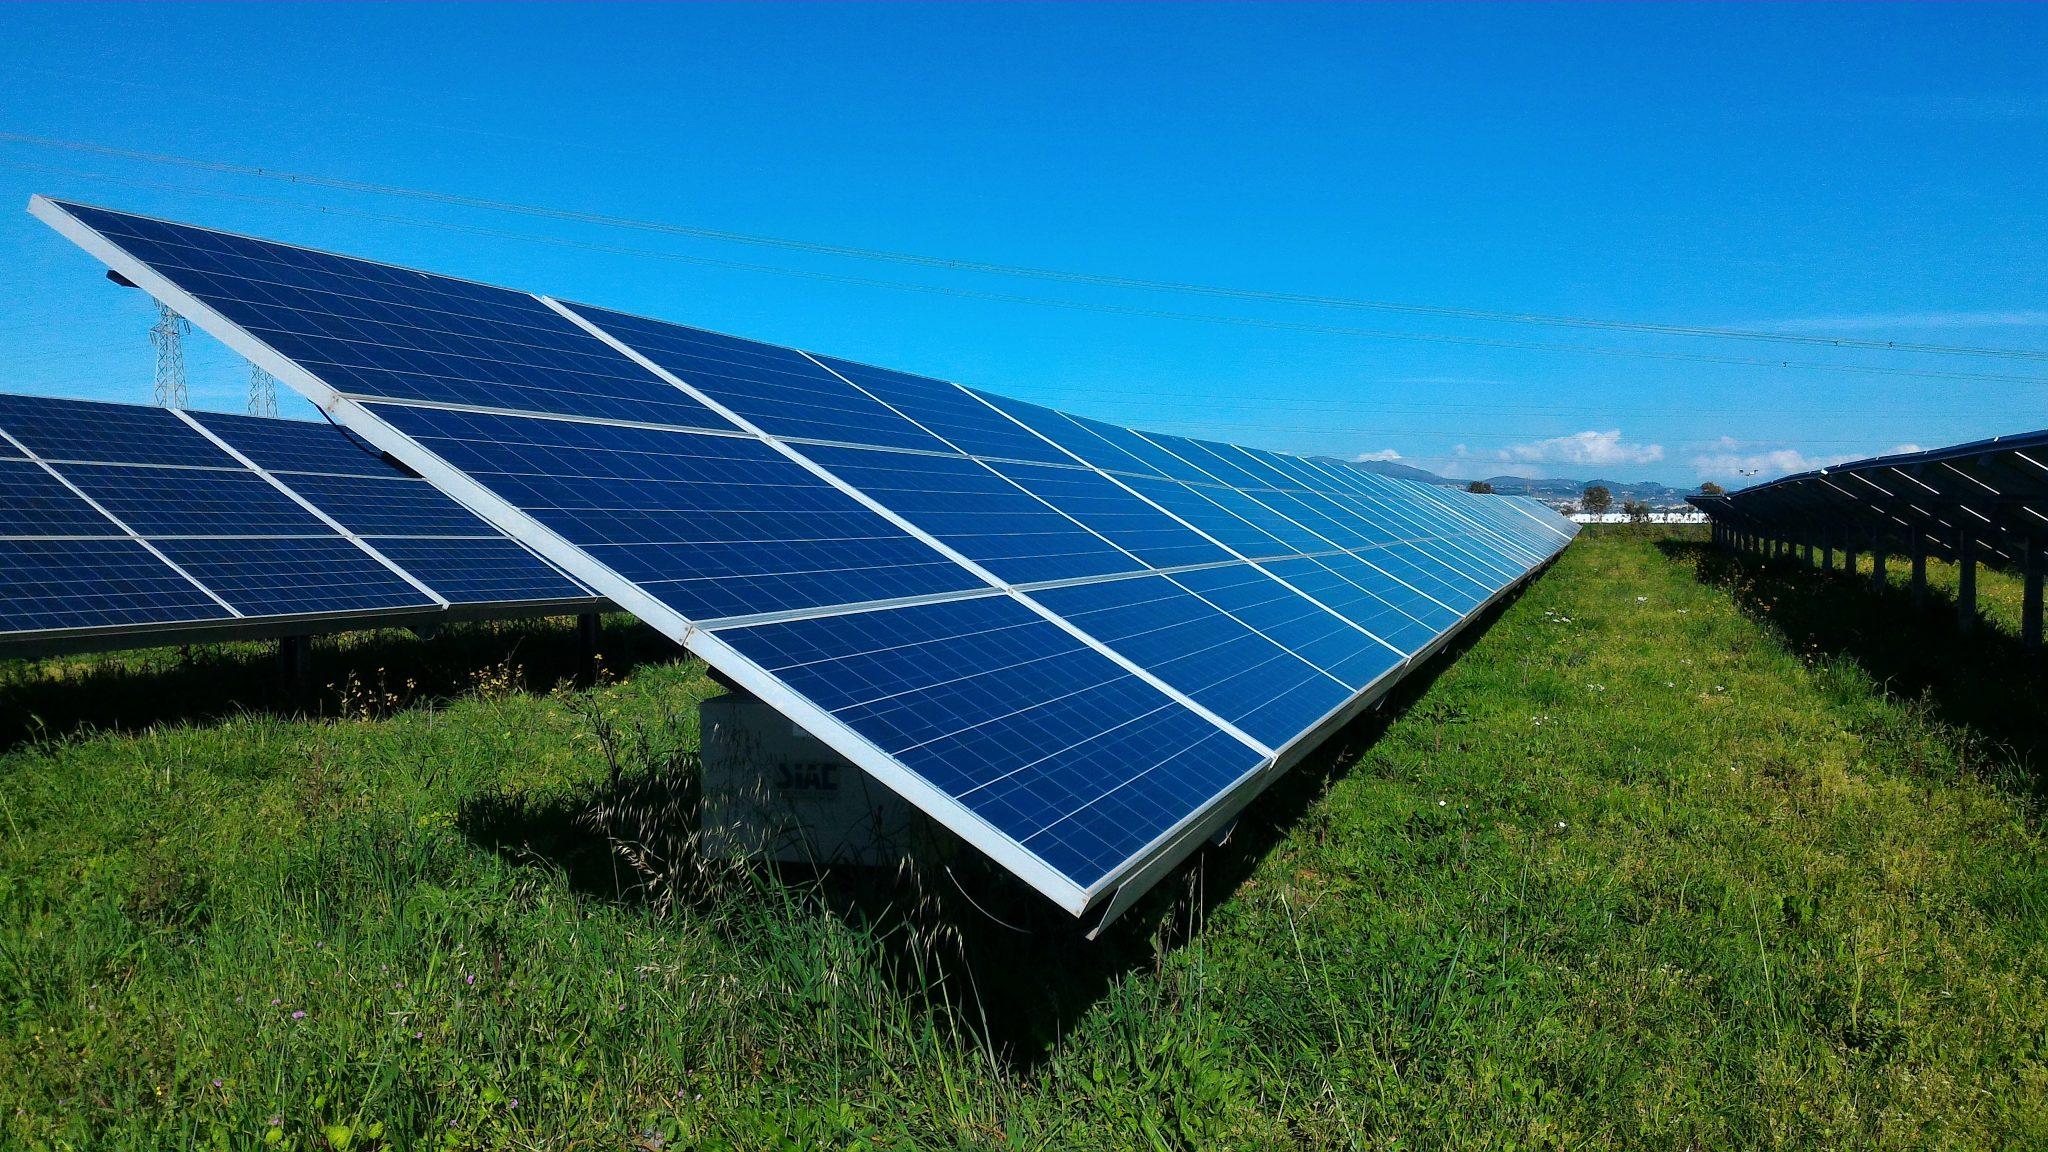 Photovoltaics Mrp Energy